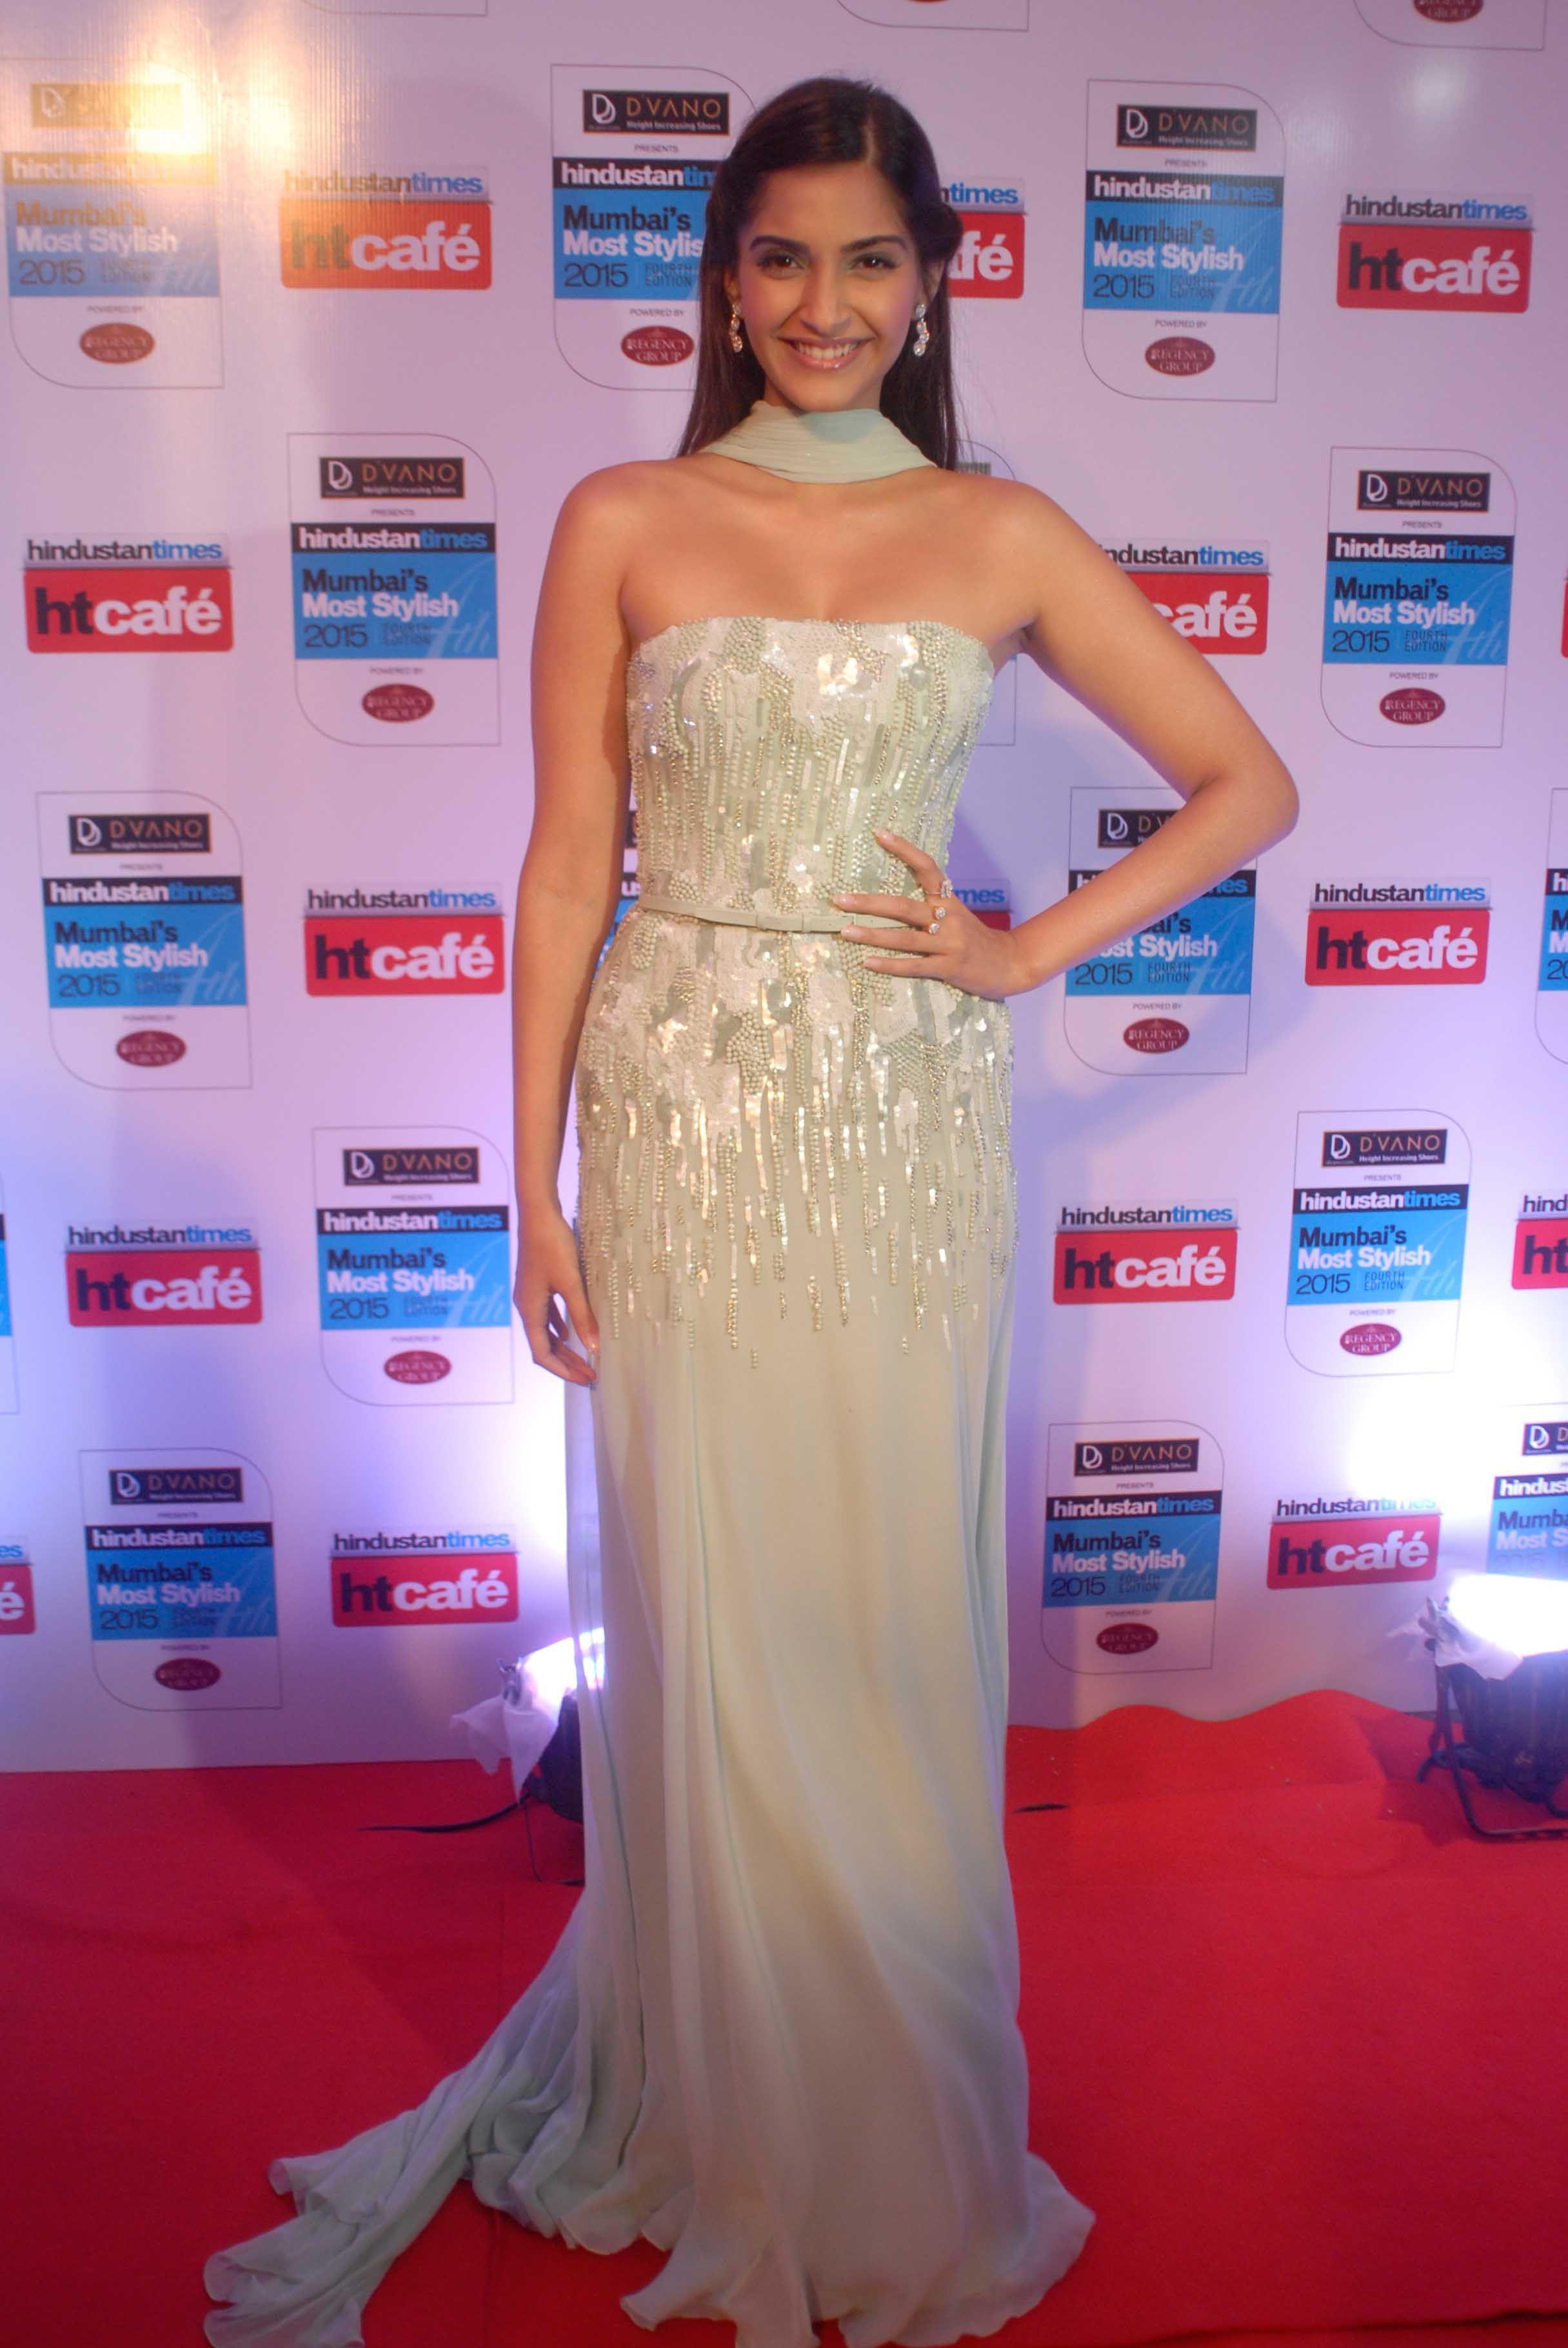 to wear - Times hindustan mumbai most stylish awards video